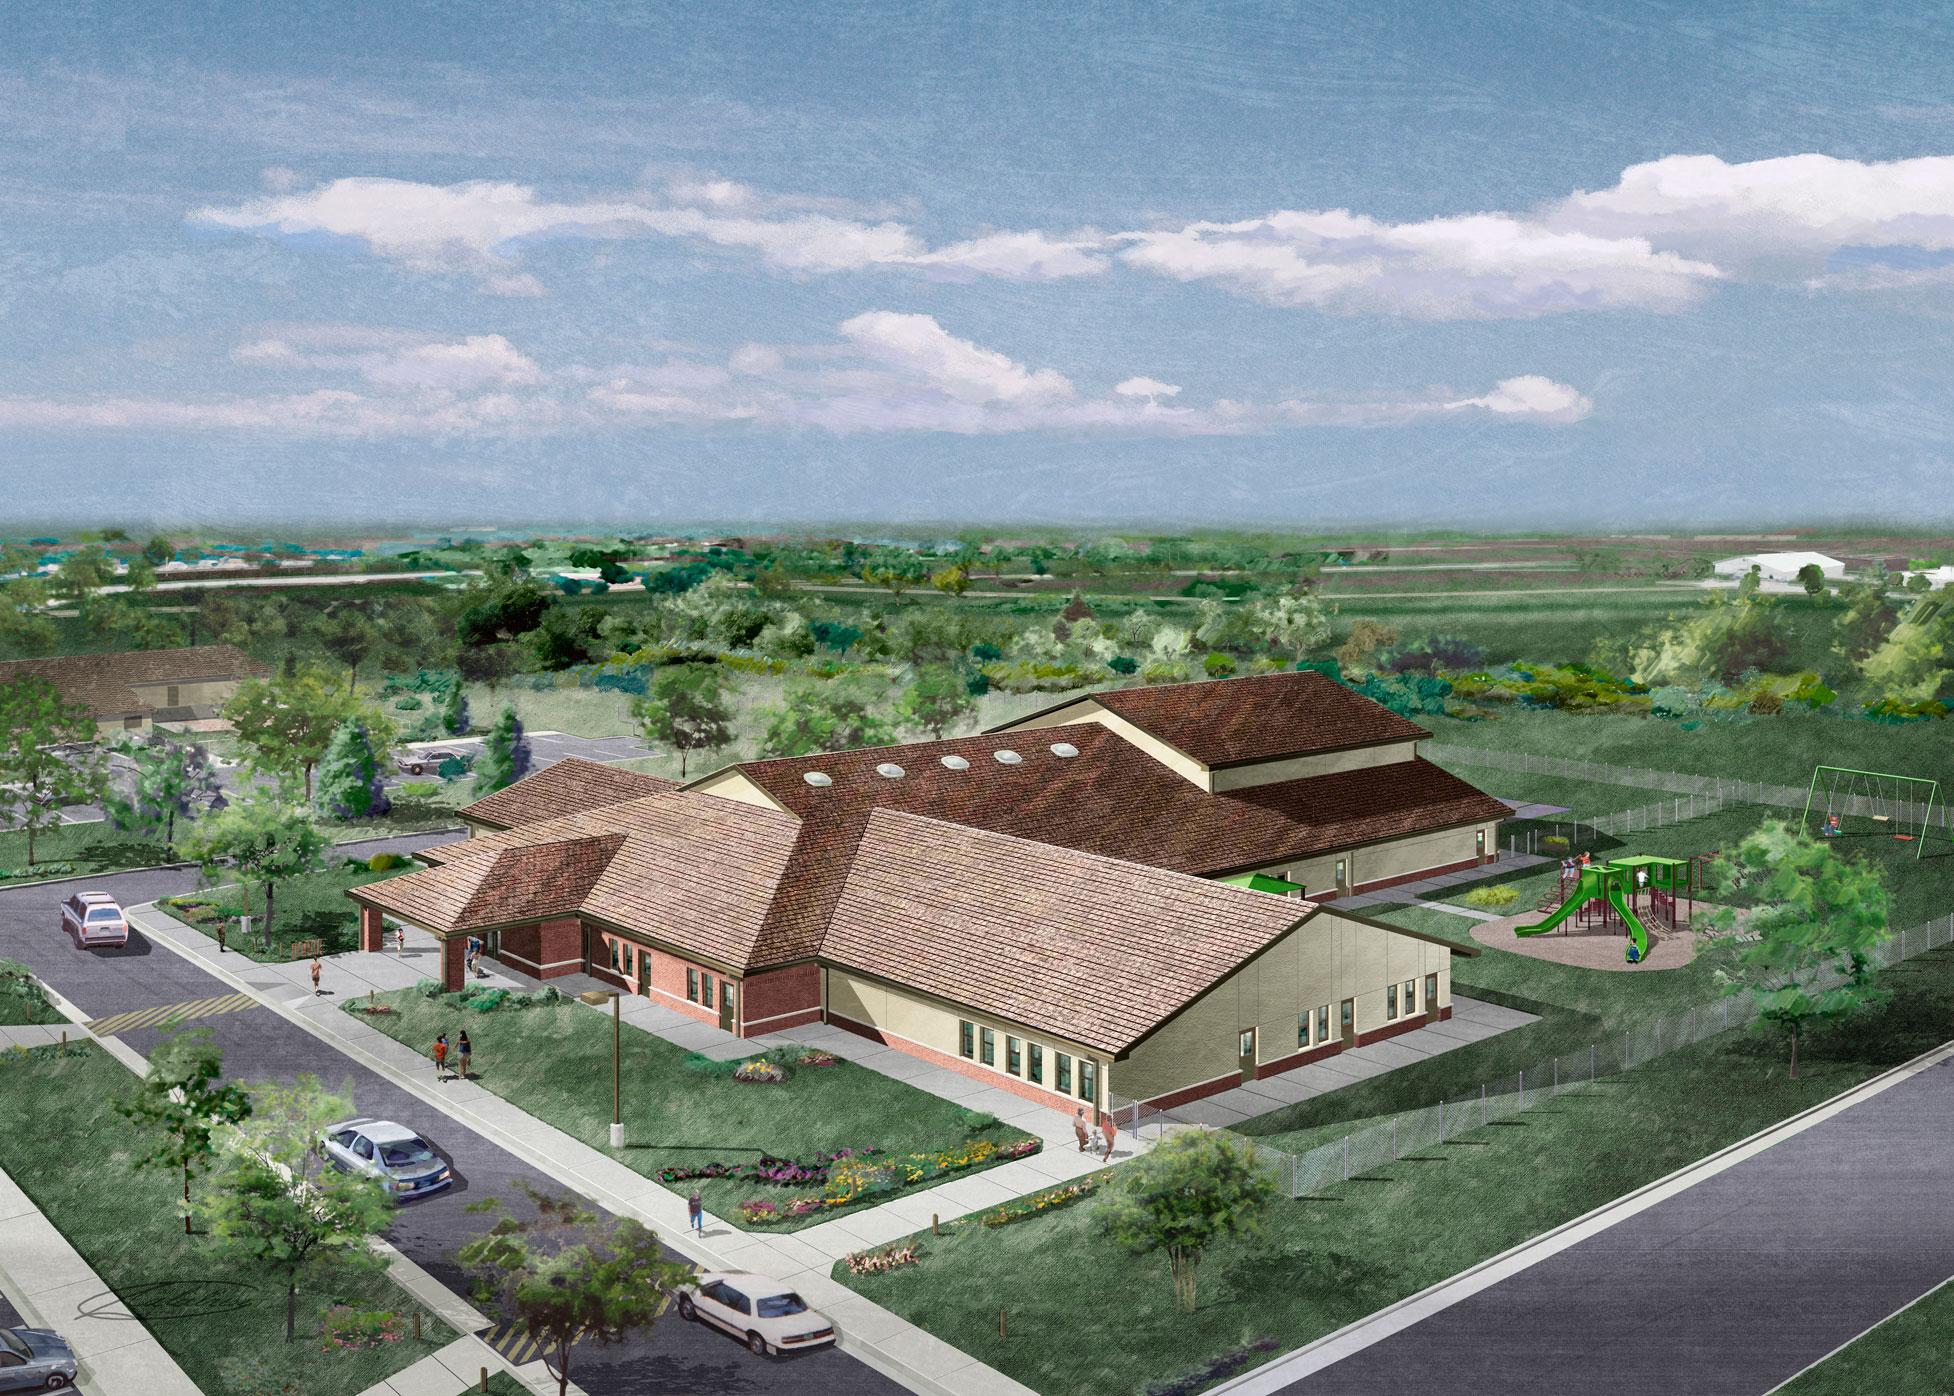 FORT LEONARD WOOD CHILD DEVELOPMENT CENTER - Fort Leonard Wood, MO